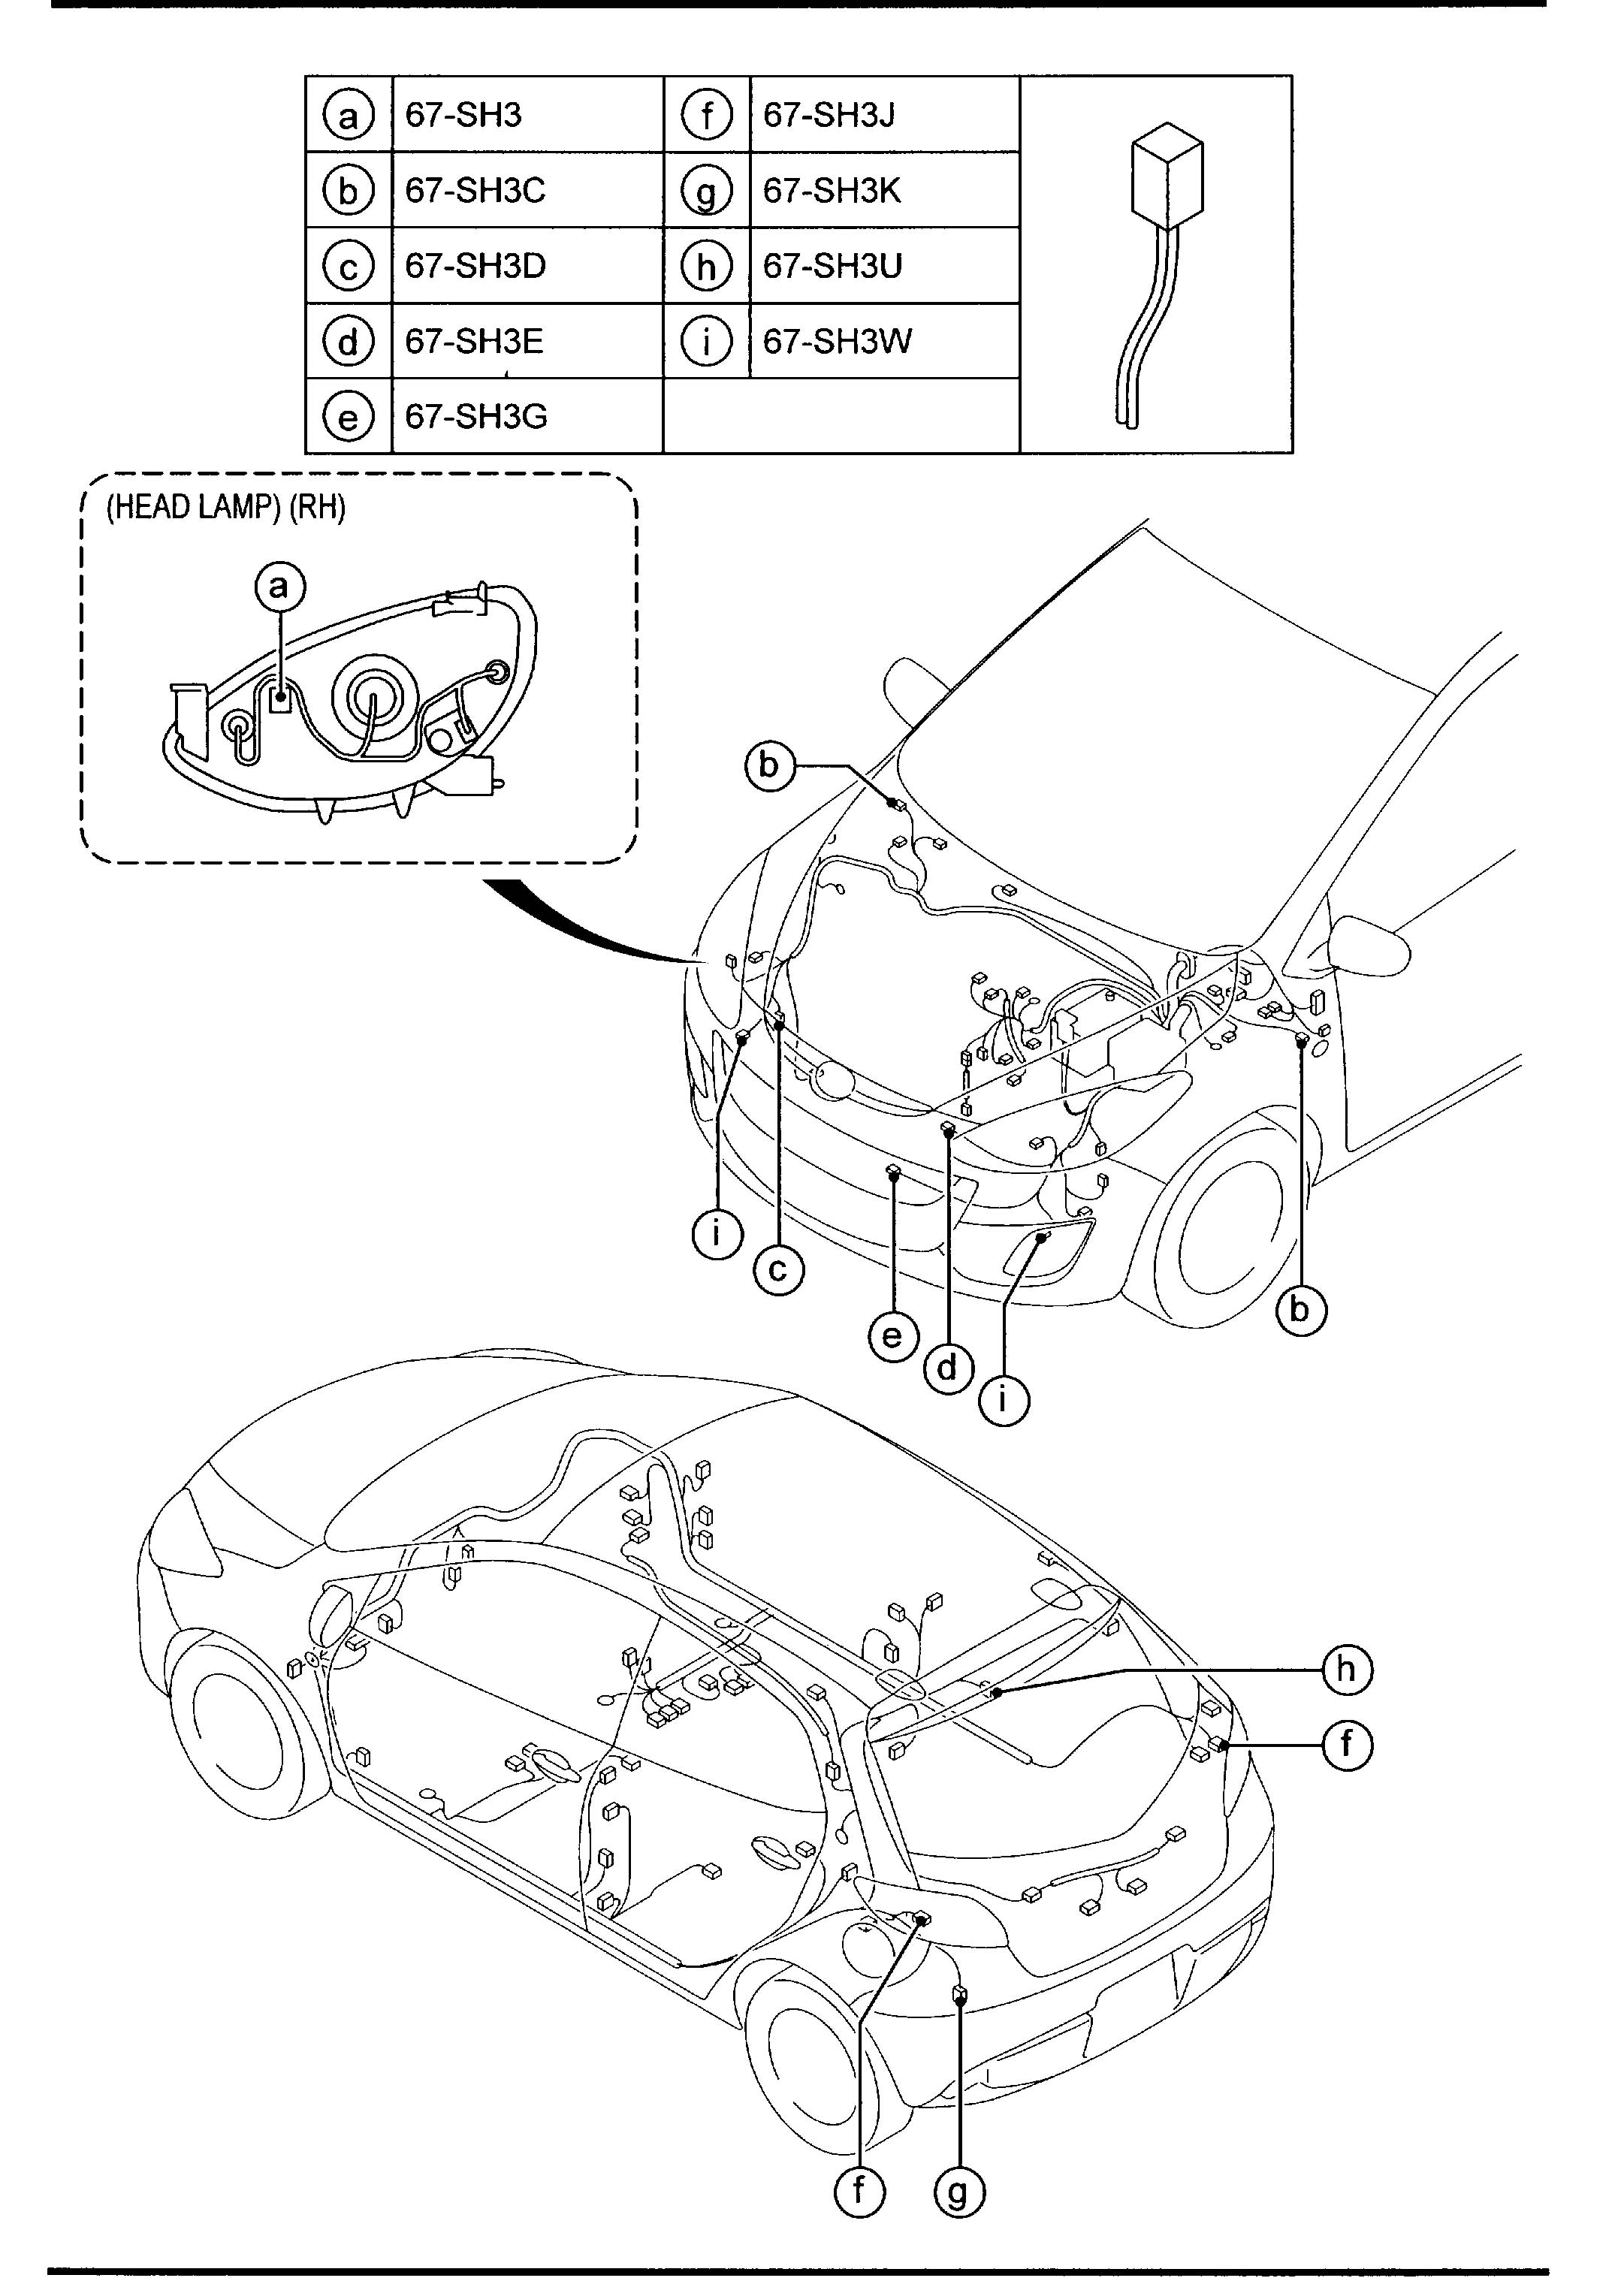 Mazda Cx-9 Relay  Blower  Typestd